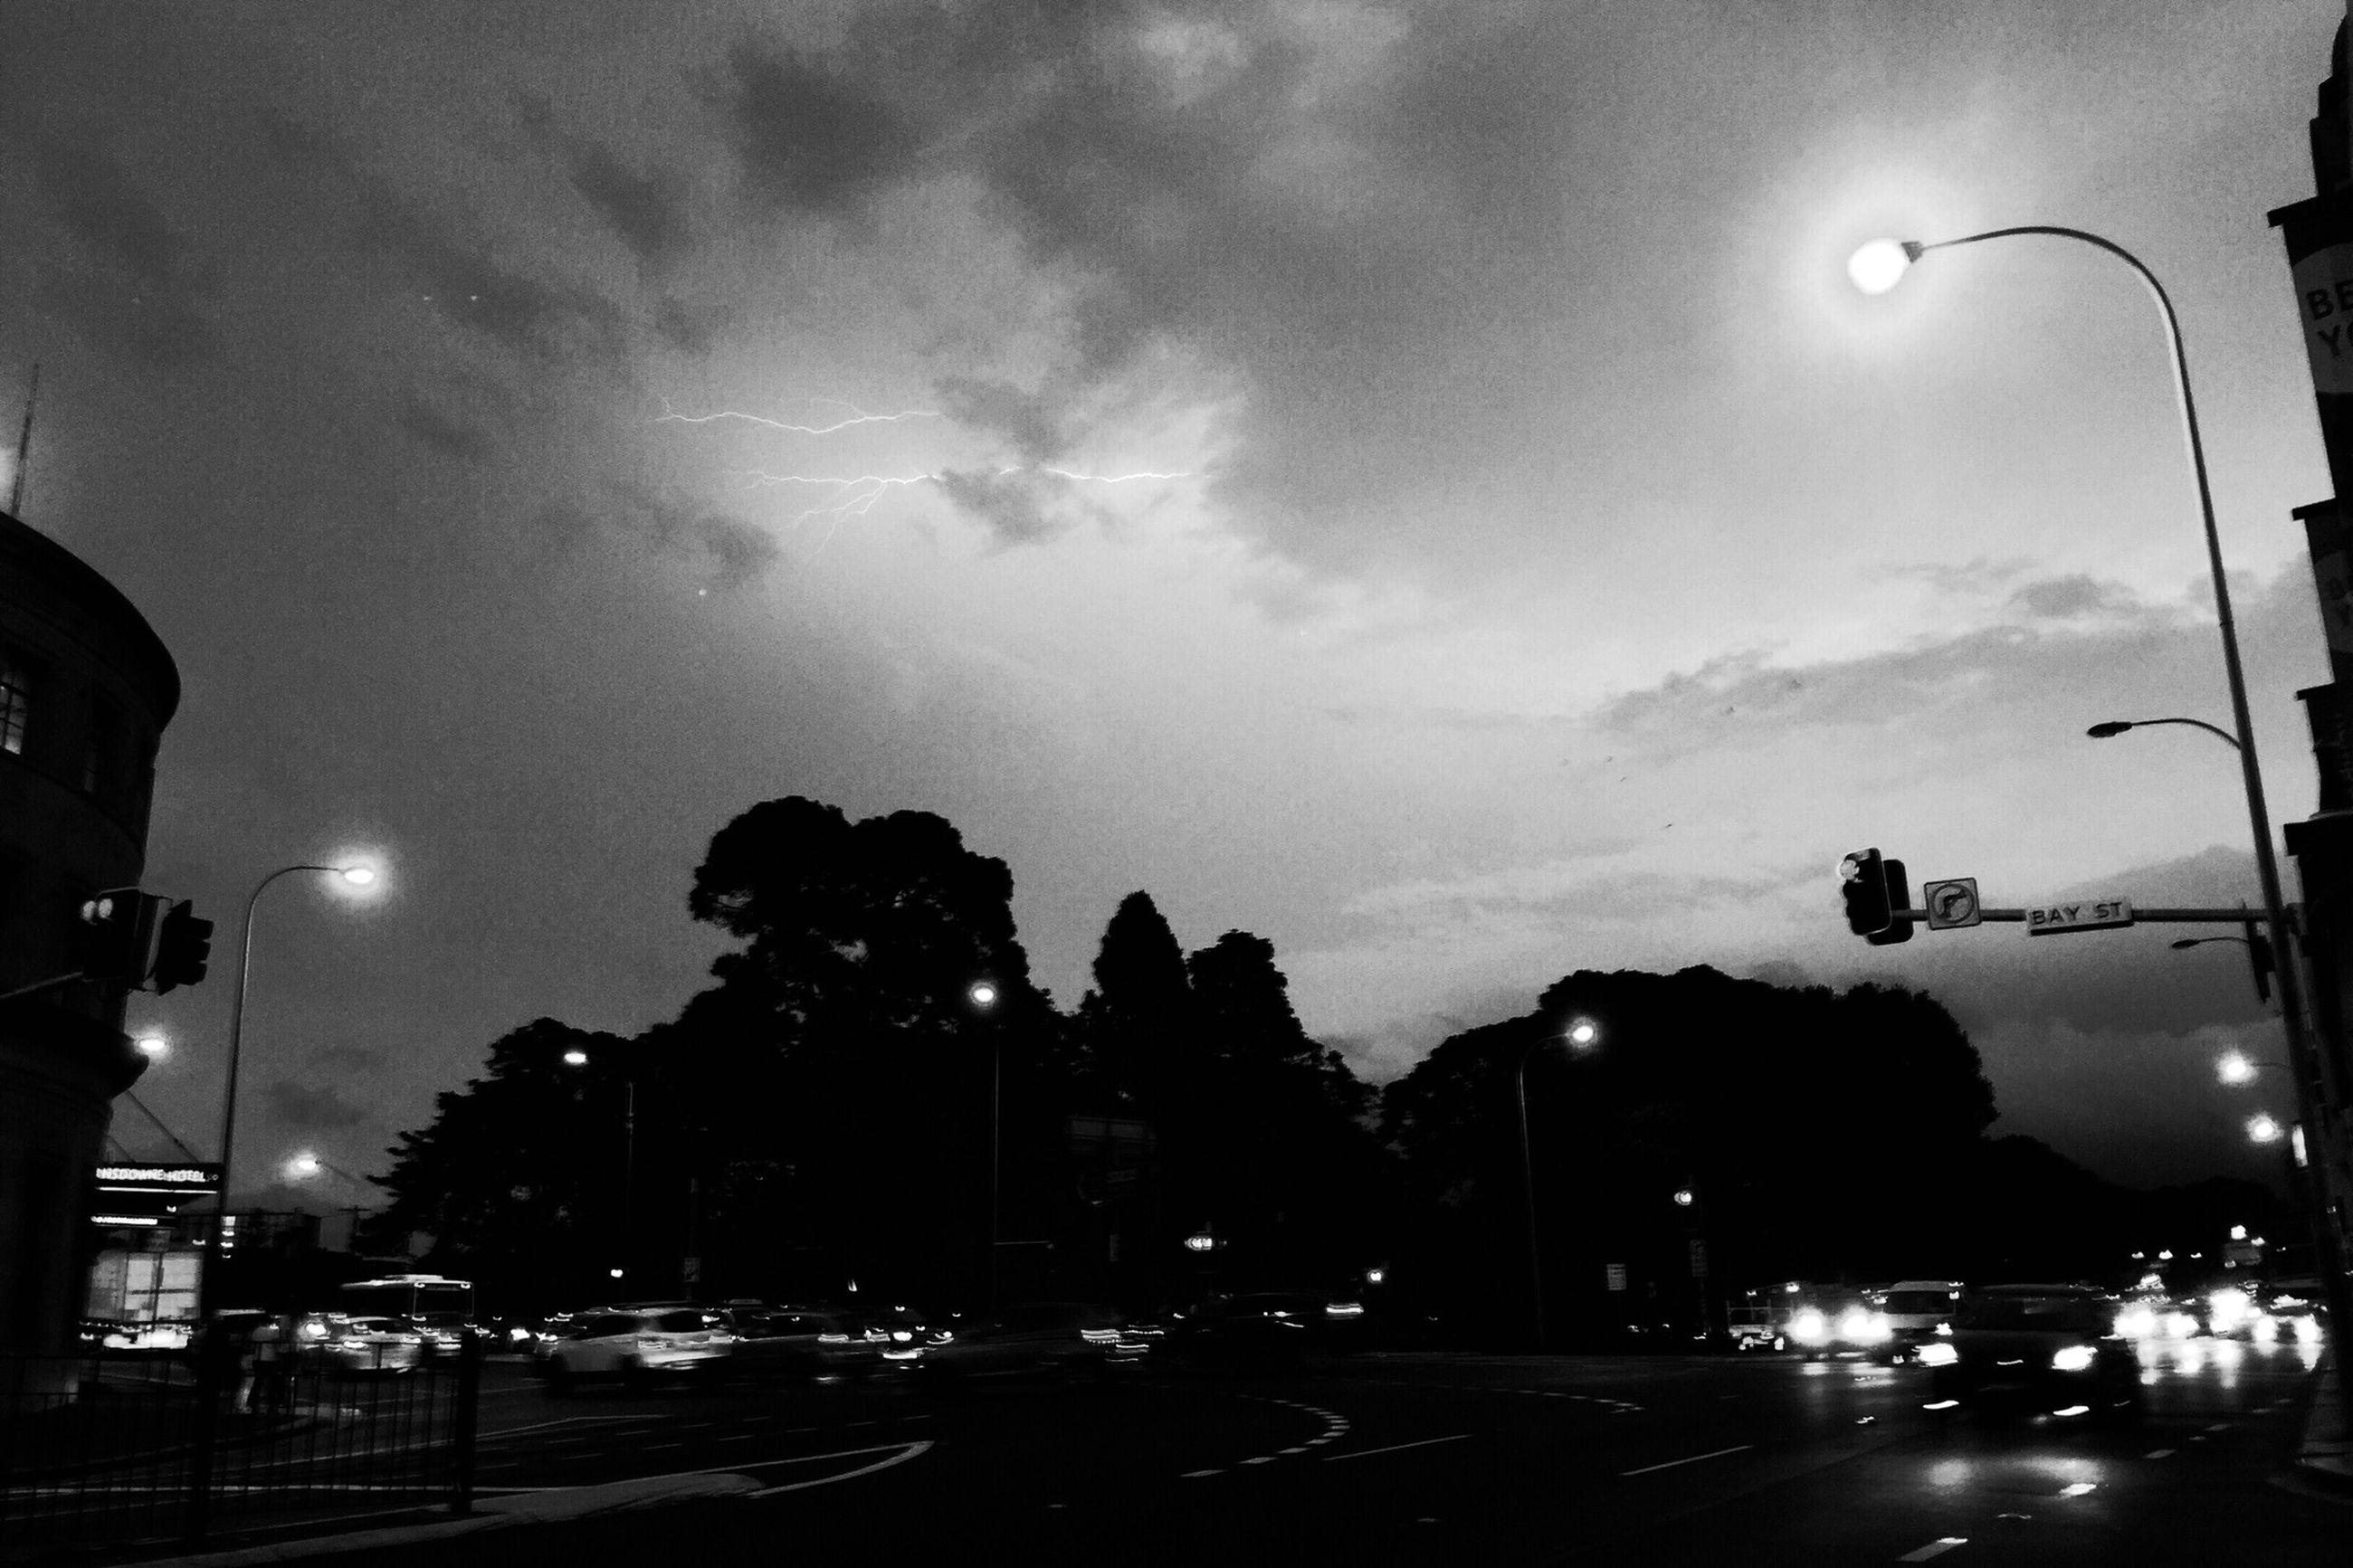 illuminated, street light, night, sky, lighting equipment, transportation, car, road, street, land vehicle, cloud - sky, silhouette, dusk, mode of transport, low angle view, outdoors, light - natural phenomenon, city, cloudy, city street